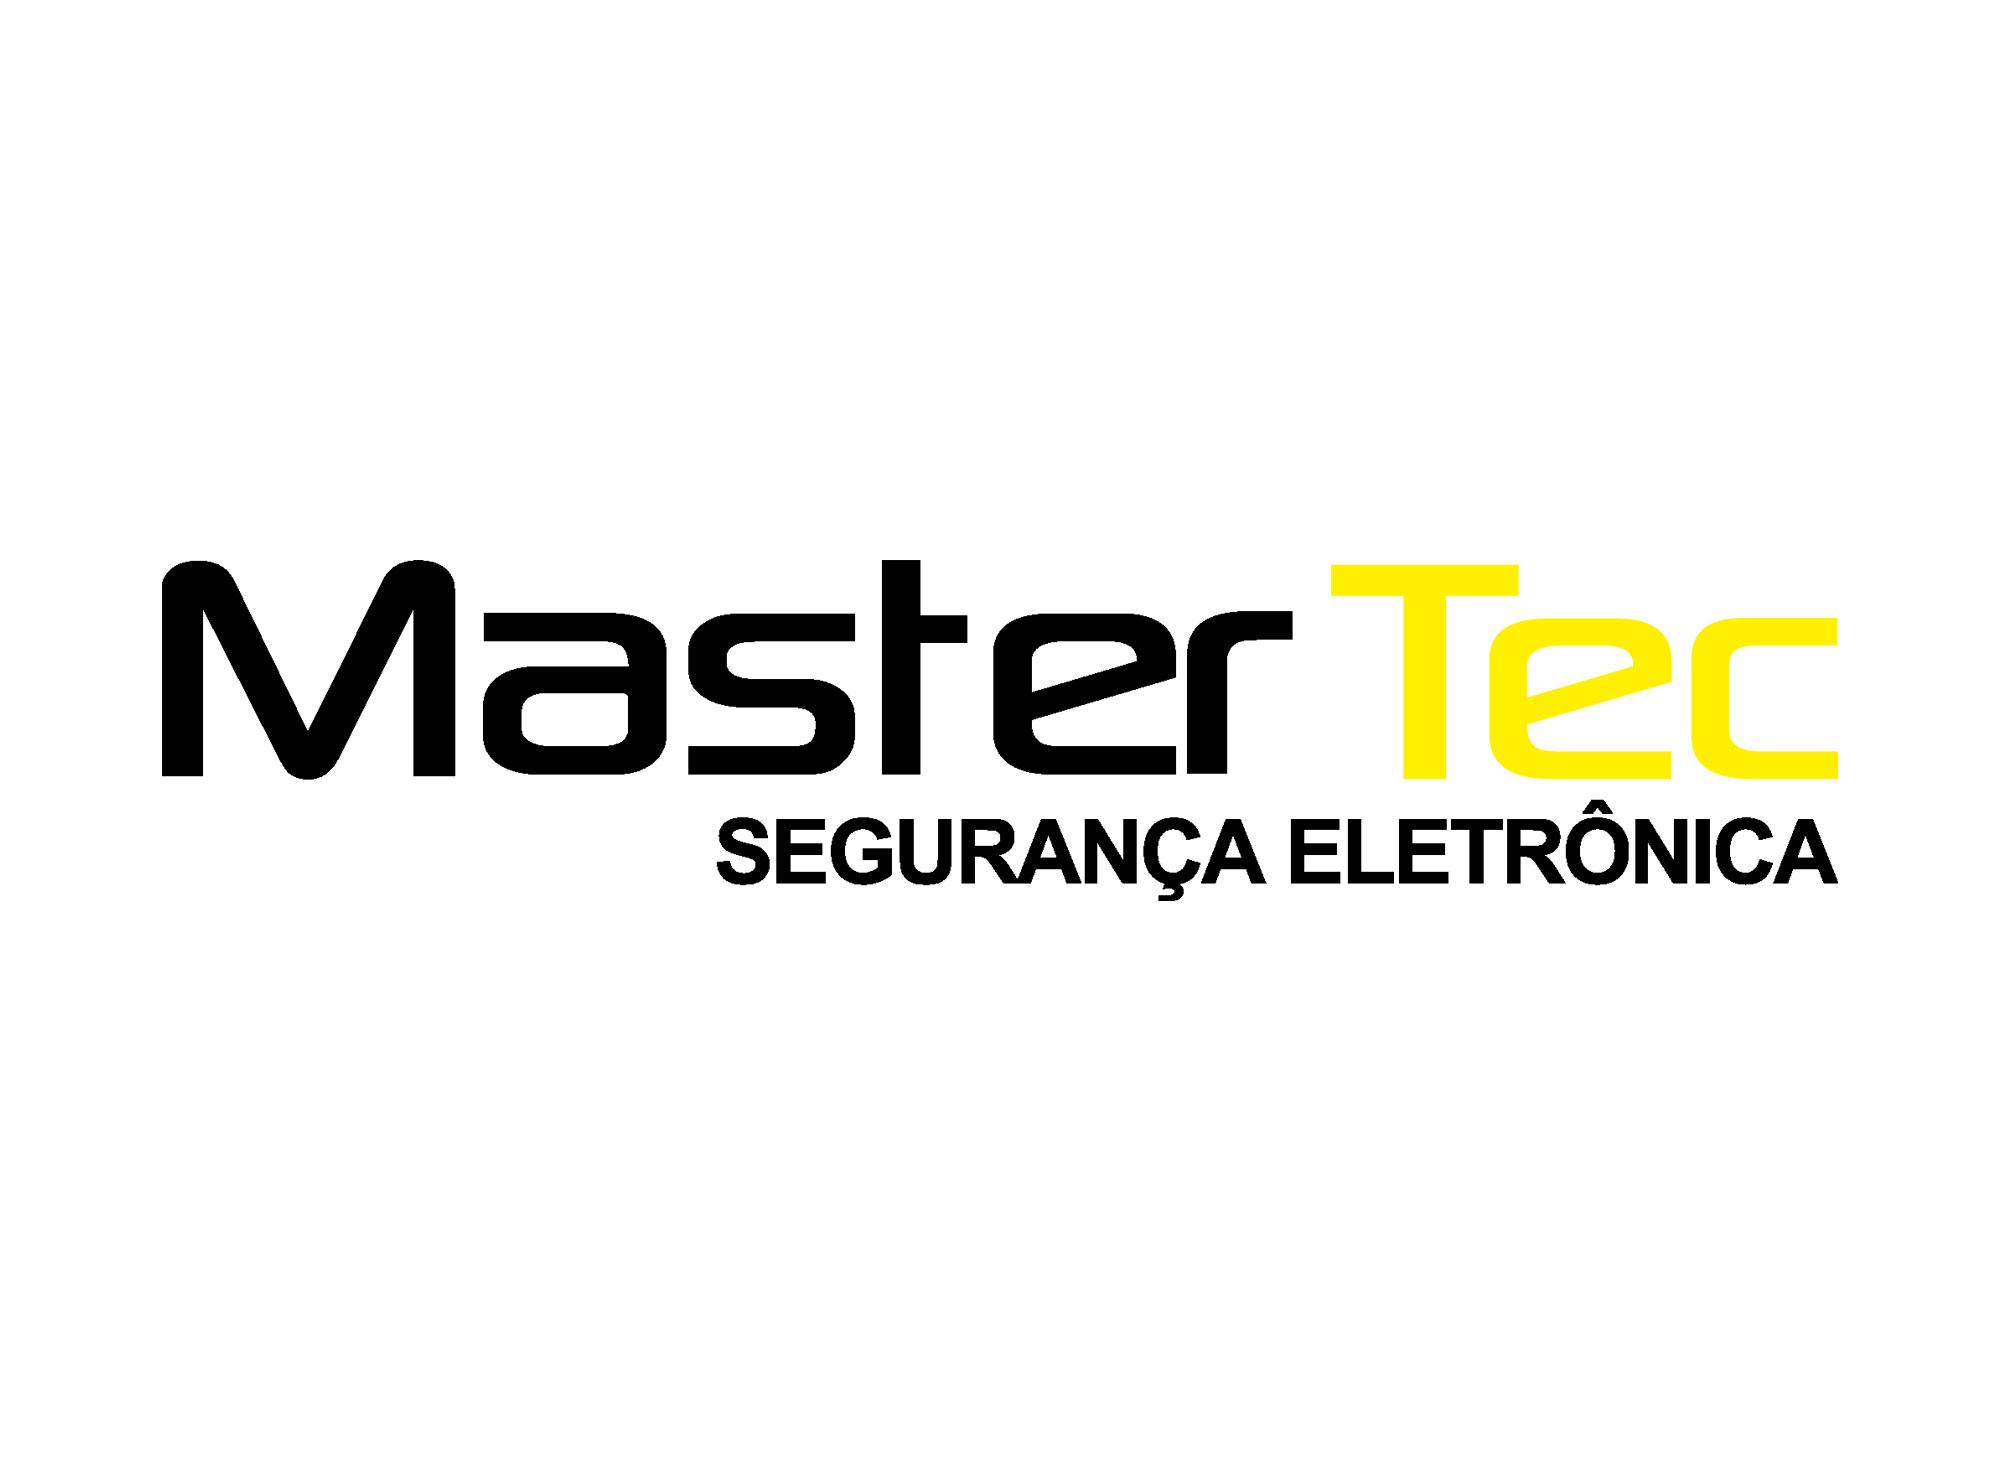 mastertec-seguranca-cliente-agencia-diretriz-digital-marketing-fortaleza